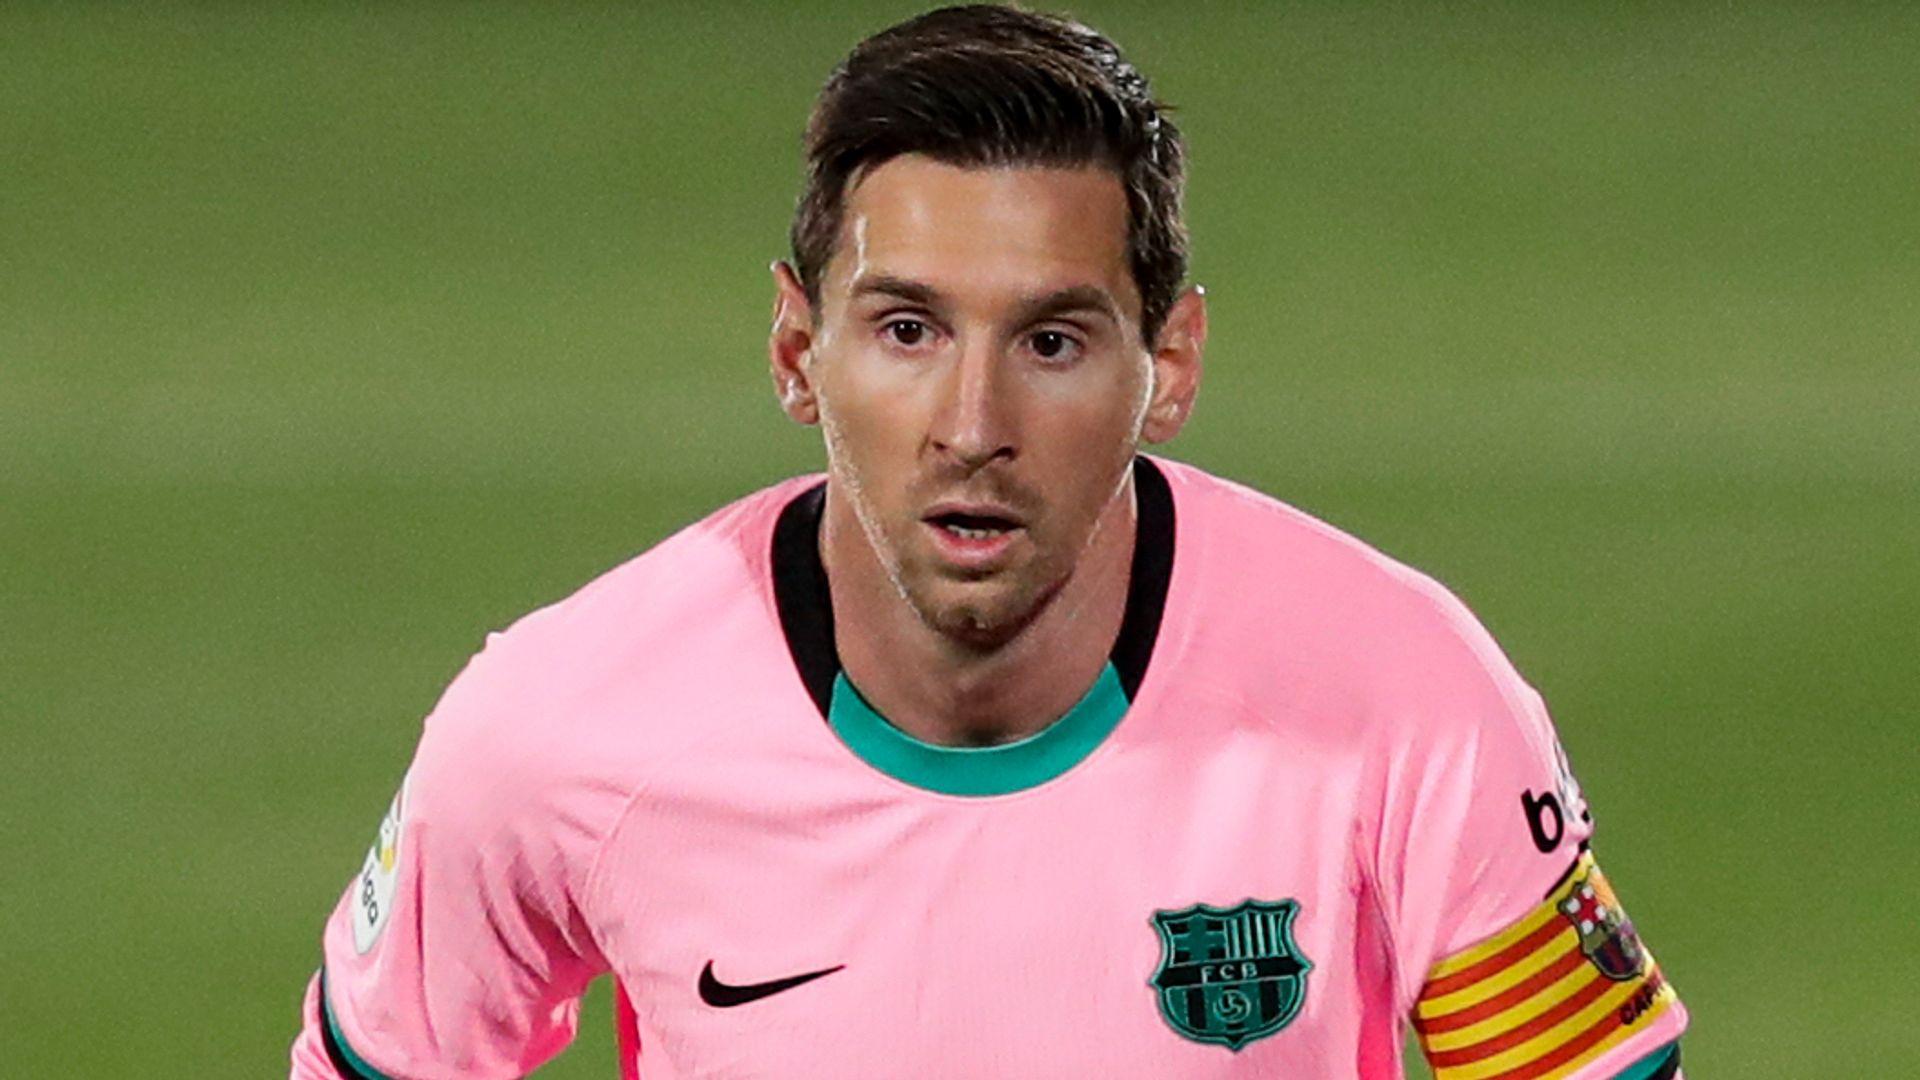 'Man City have closed door on Messi pursuit'